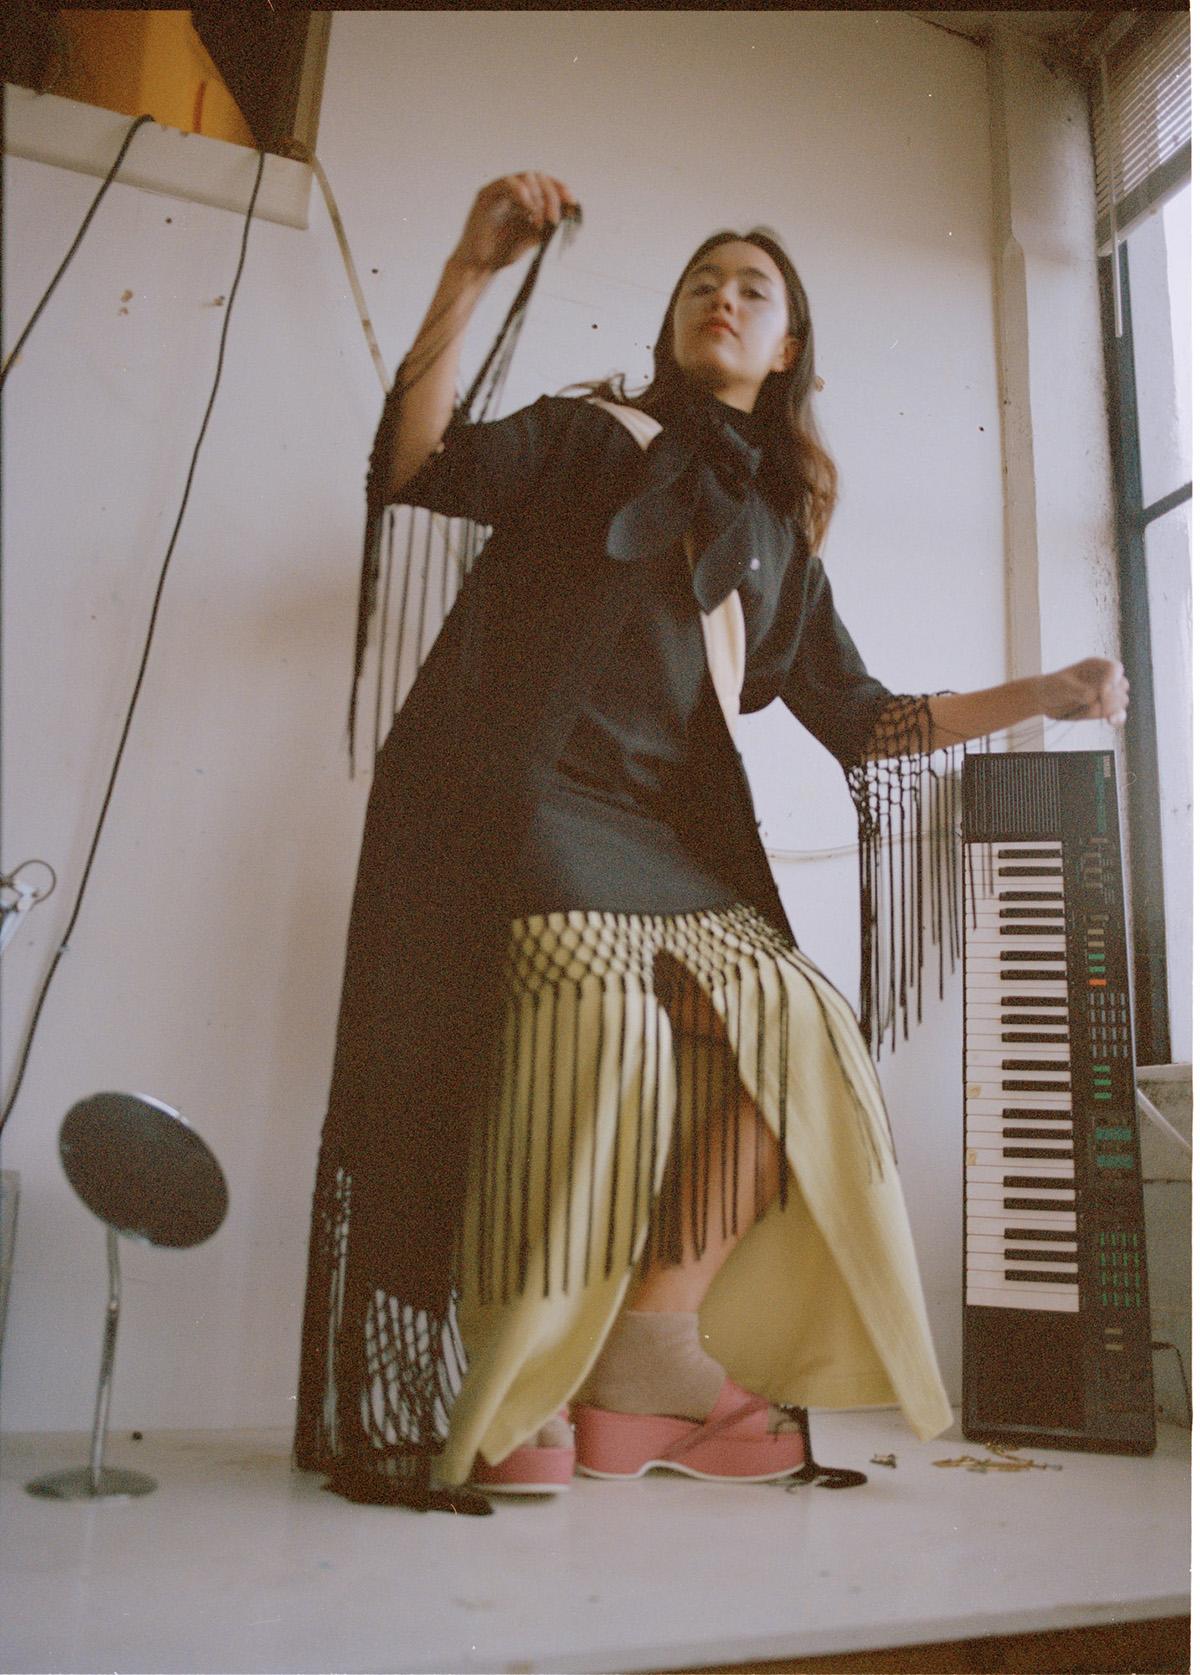 Dress  Esau Yori  Skirt & socks  Baserange  Shoes  Stylist's own